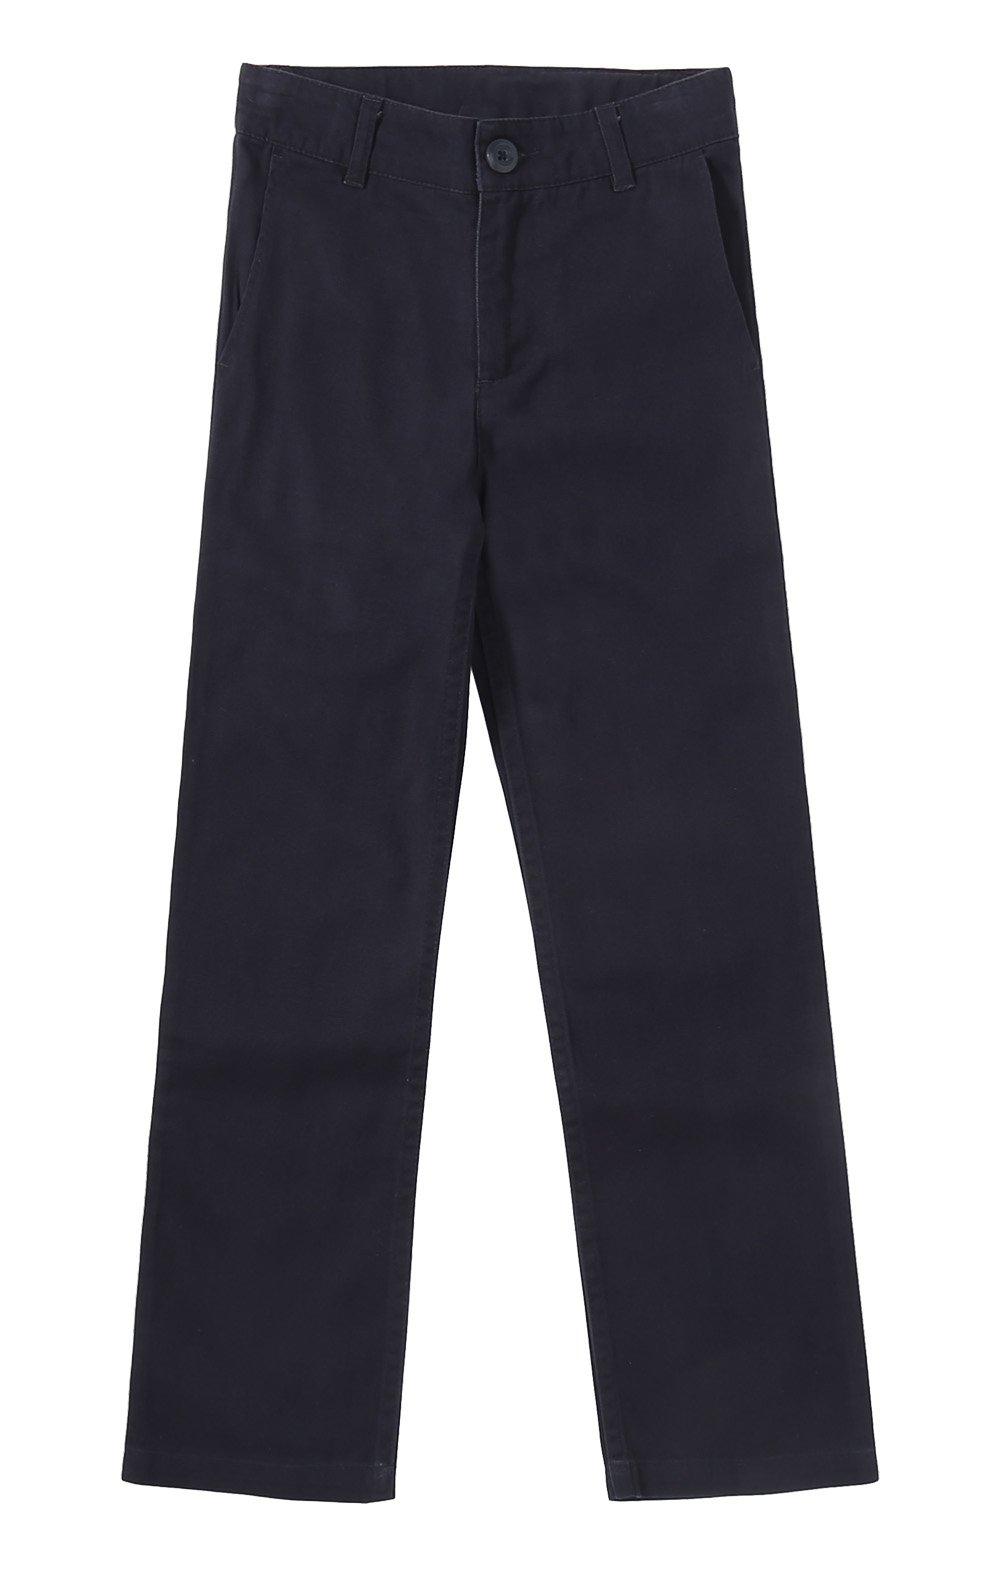 Bienzoe Girl's School Uniforms Stretchy Twill Adjust Waist Flat Front Pants Navy Size 10